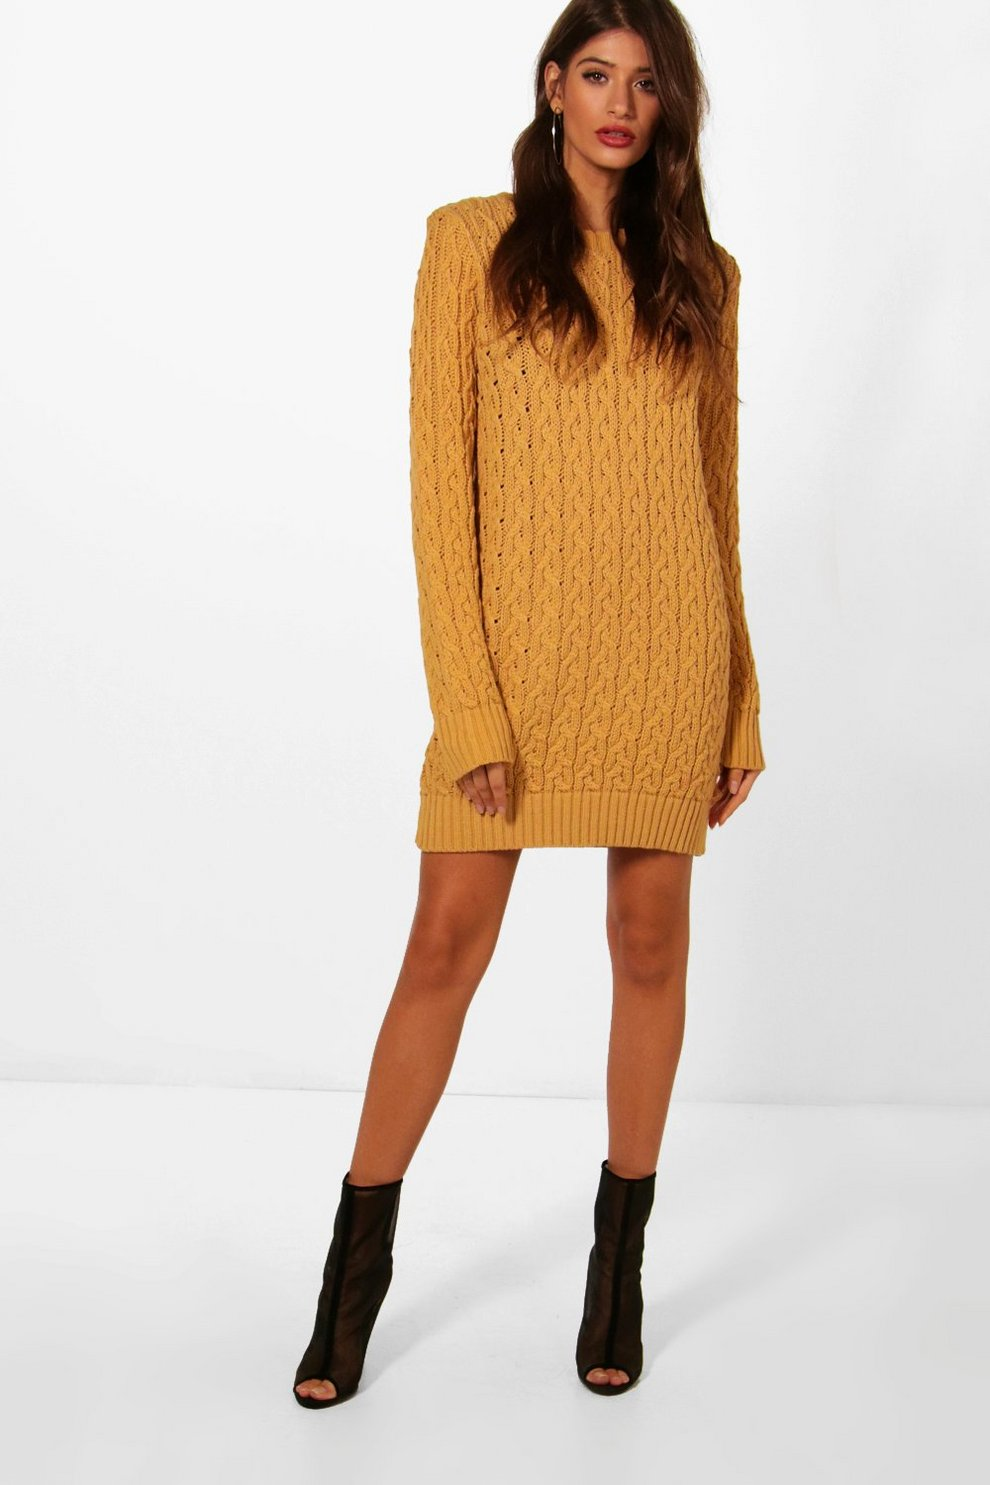 Robe pull en tricot torsadé plein   Boohoo 70ddd834fcb3